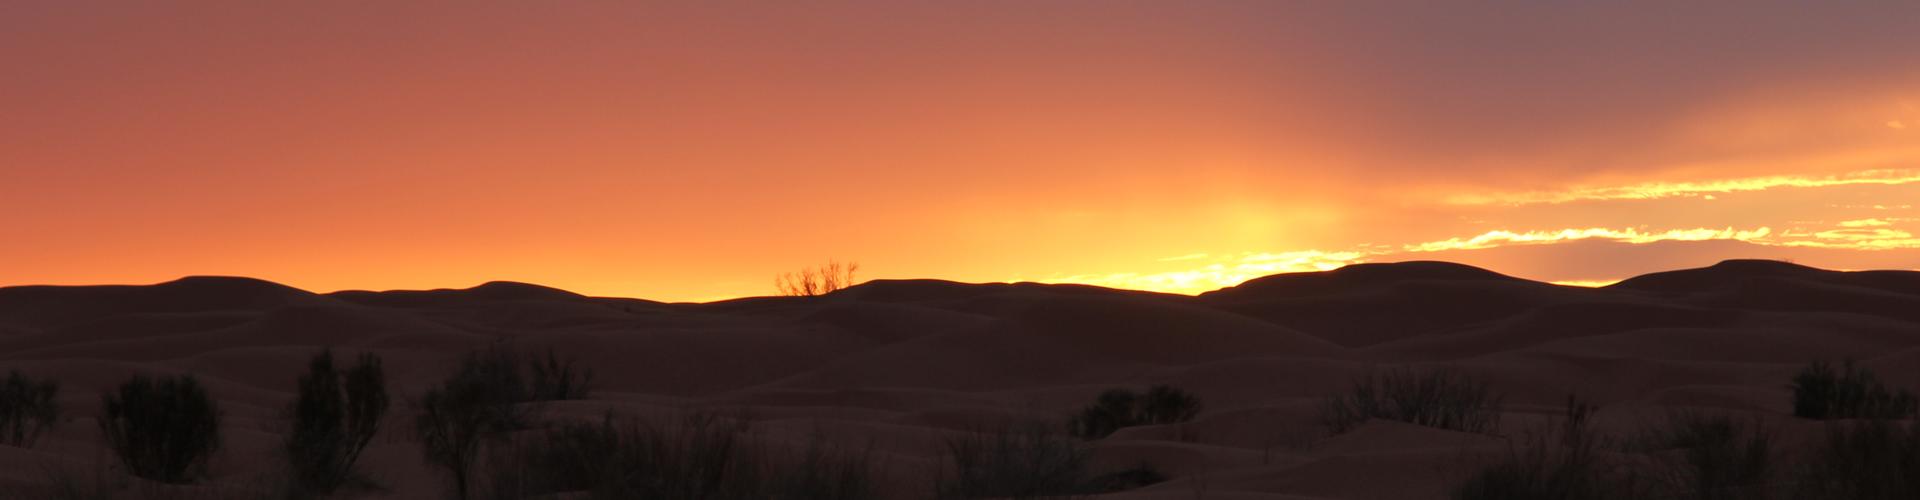 Permalink to: Desert trip in Tunesia